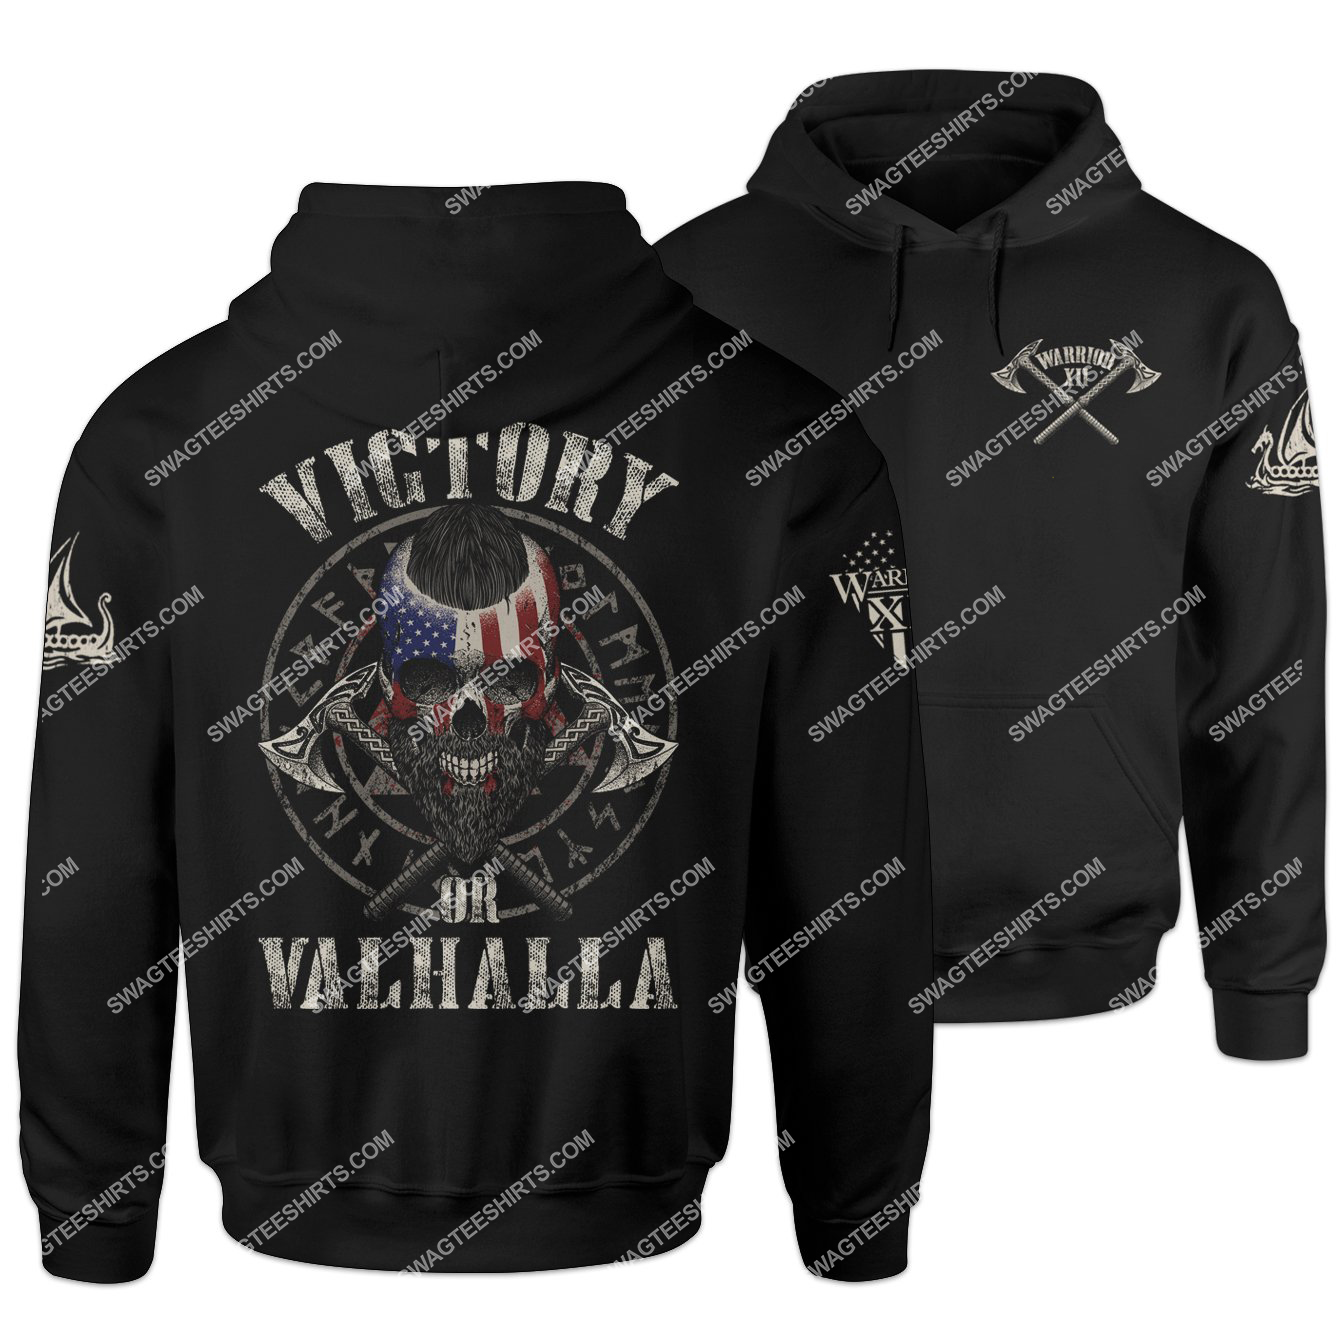 victory or valhalla viking skull american flag shirt 1 - Copy